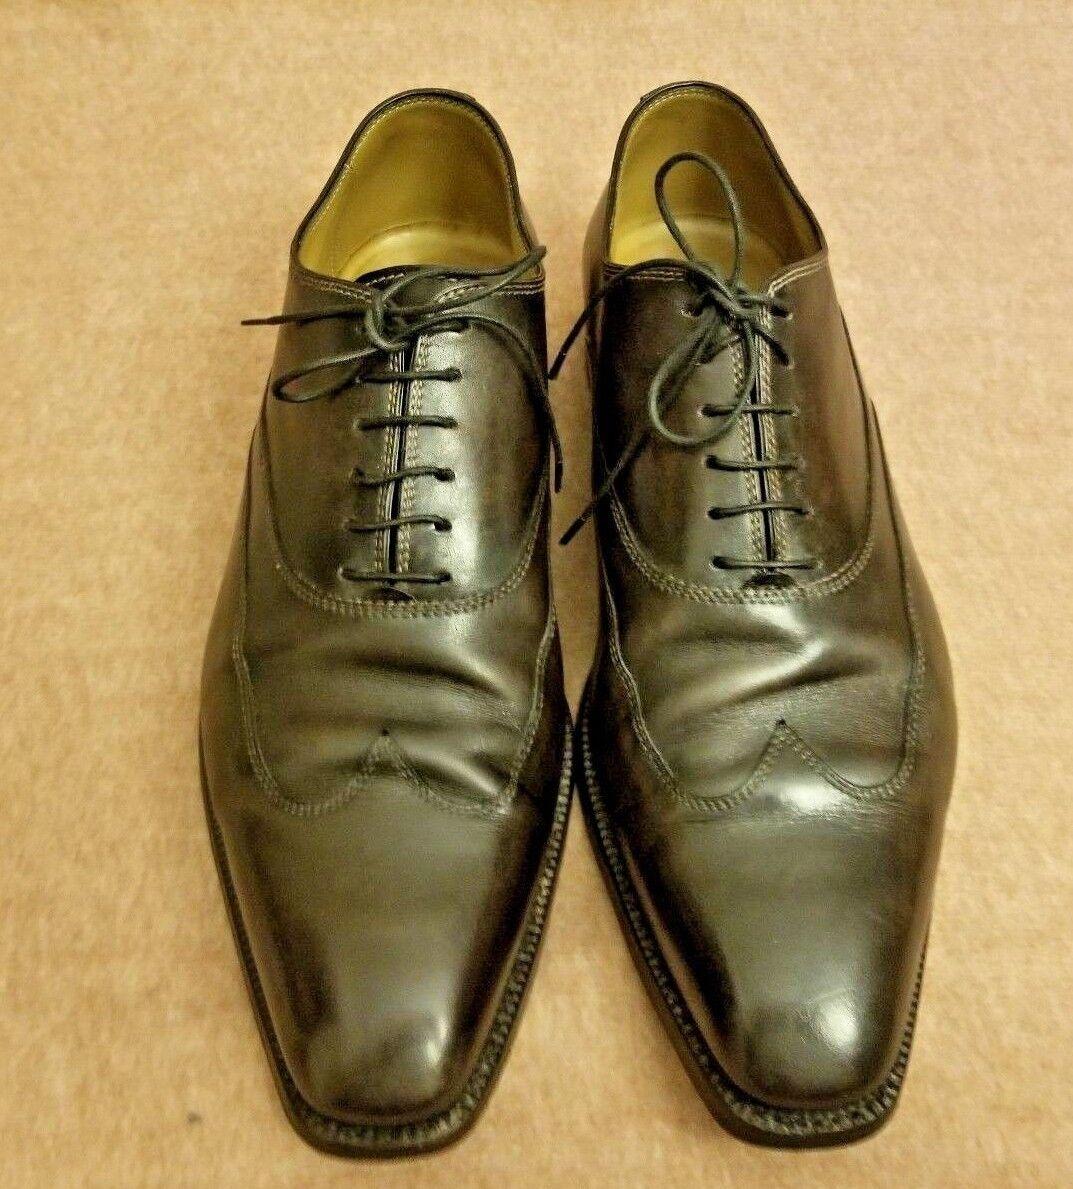 Stefanobi uomo Leather Brown Lace Up Oxford Wingtip Dress Formal Shoes Size 11 Scarpe classiche da uomo